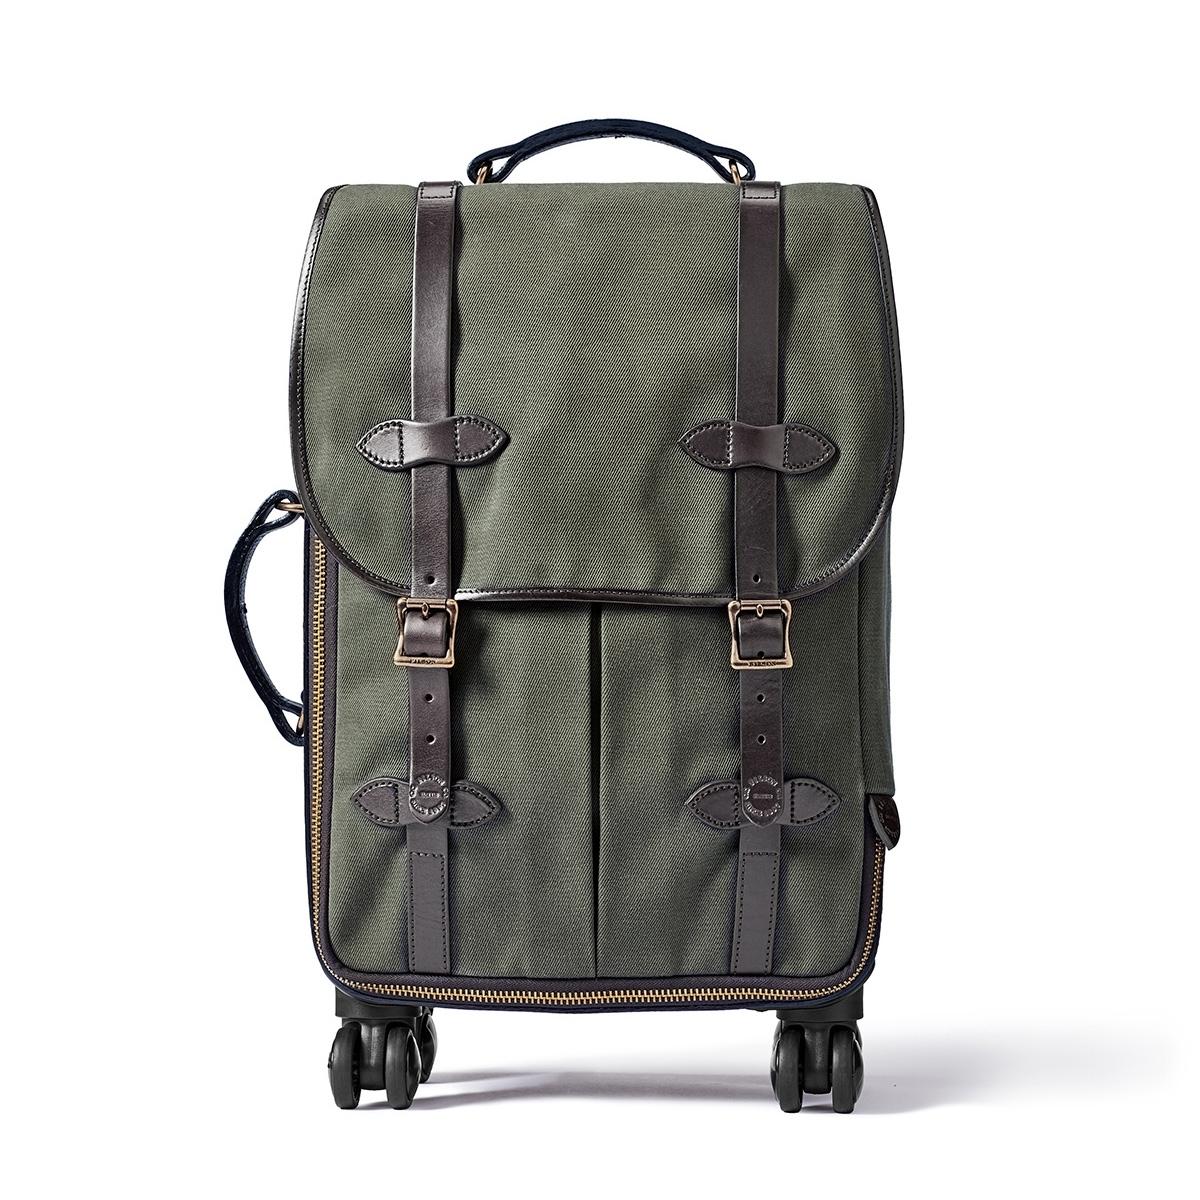 Filson Rolling 4 Wheel Carry On Bag